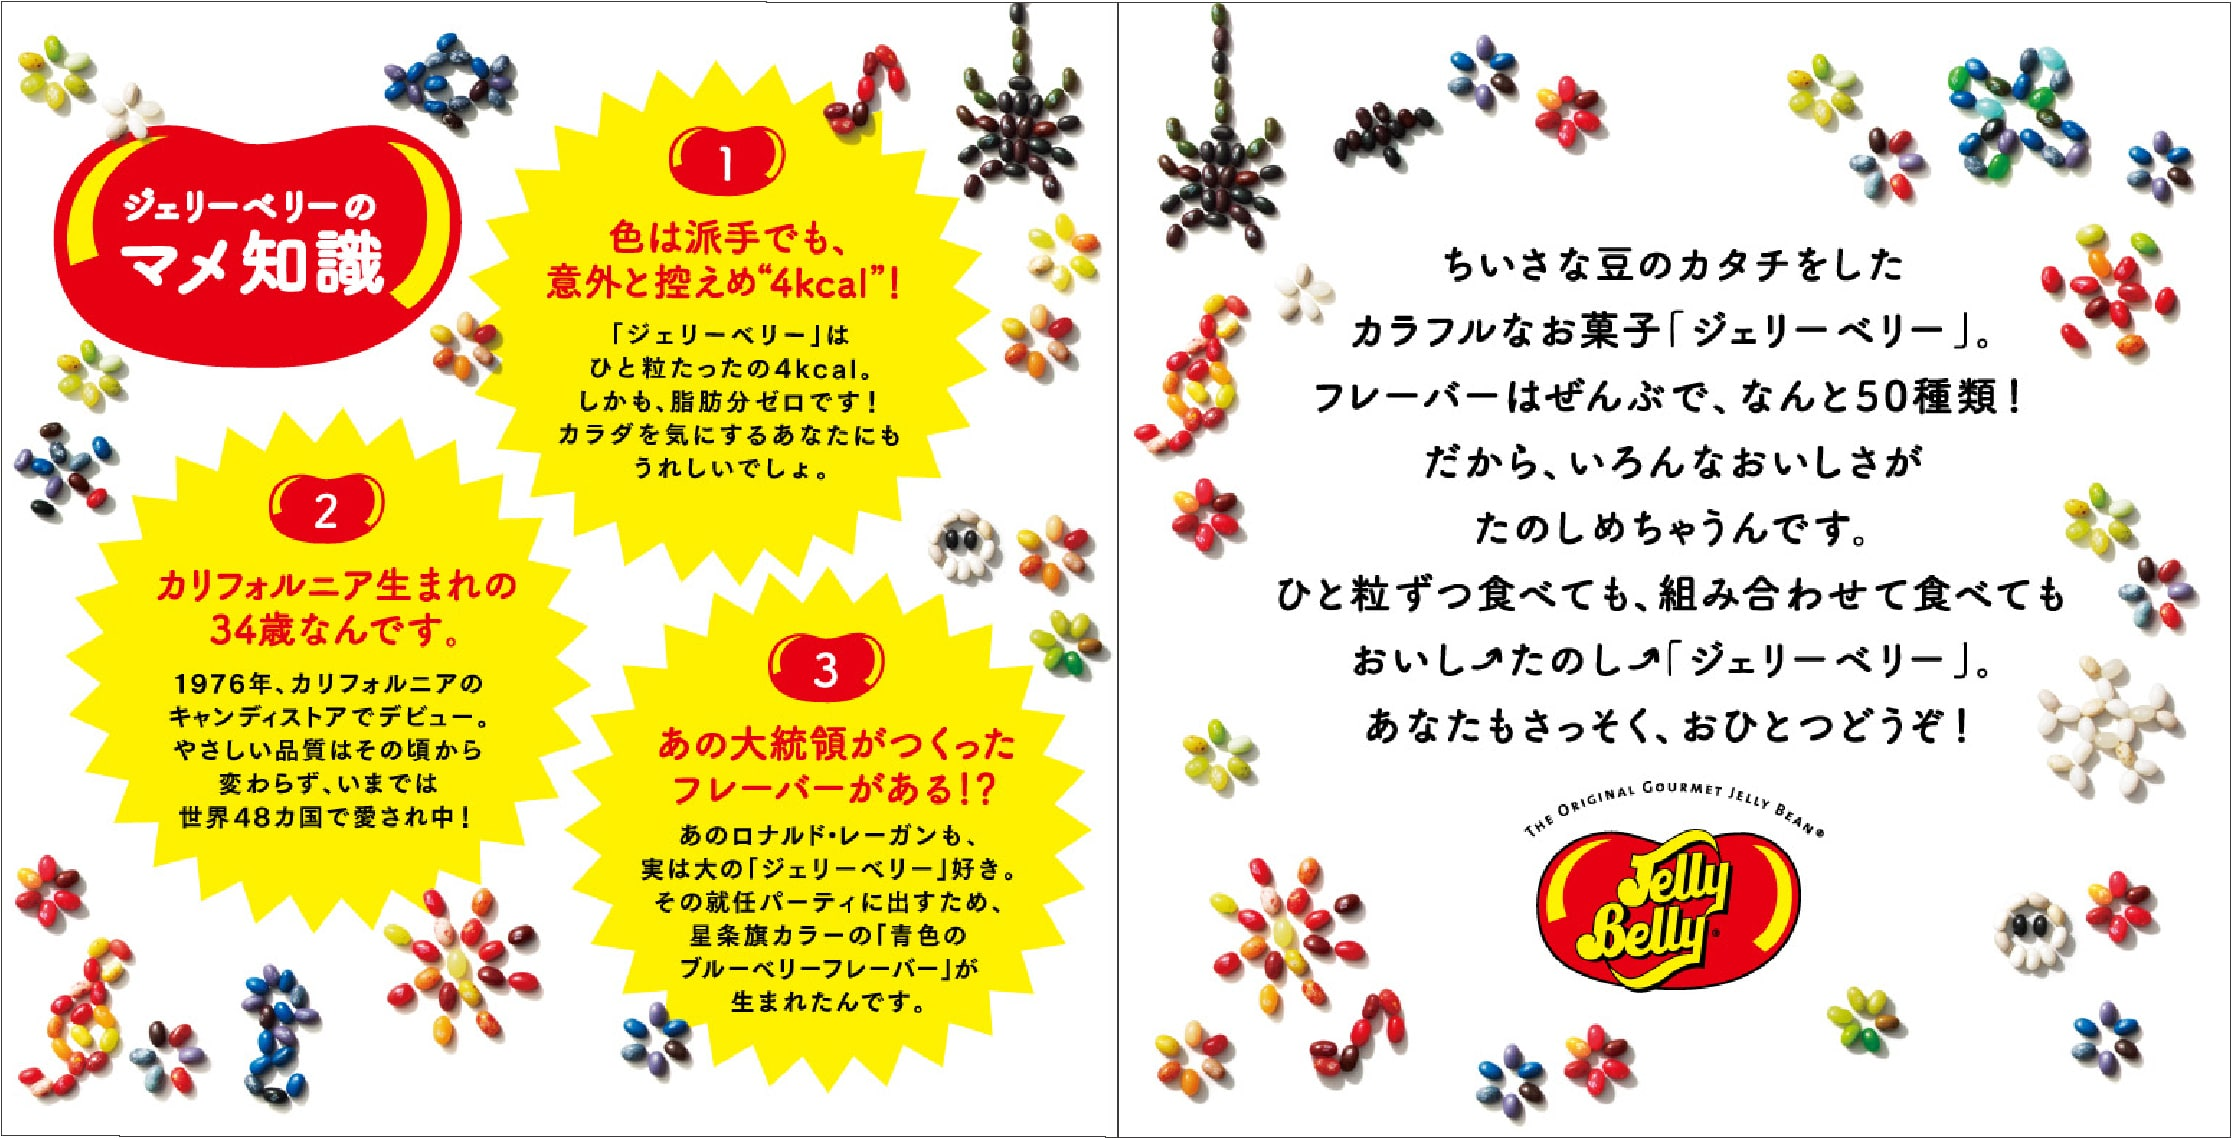 JellyBellyのパンフレット